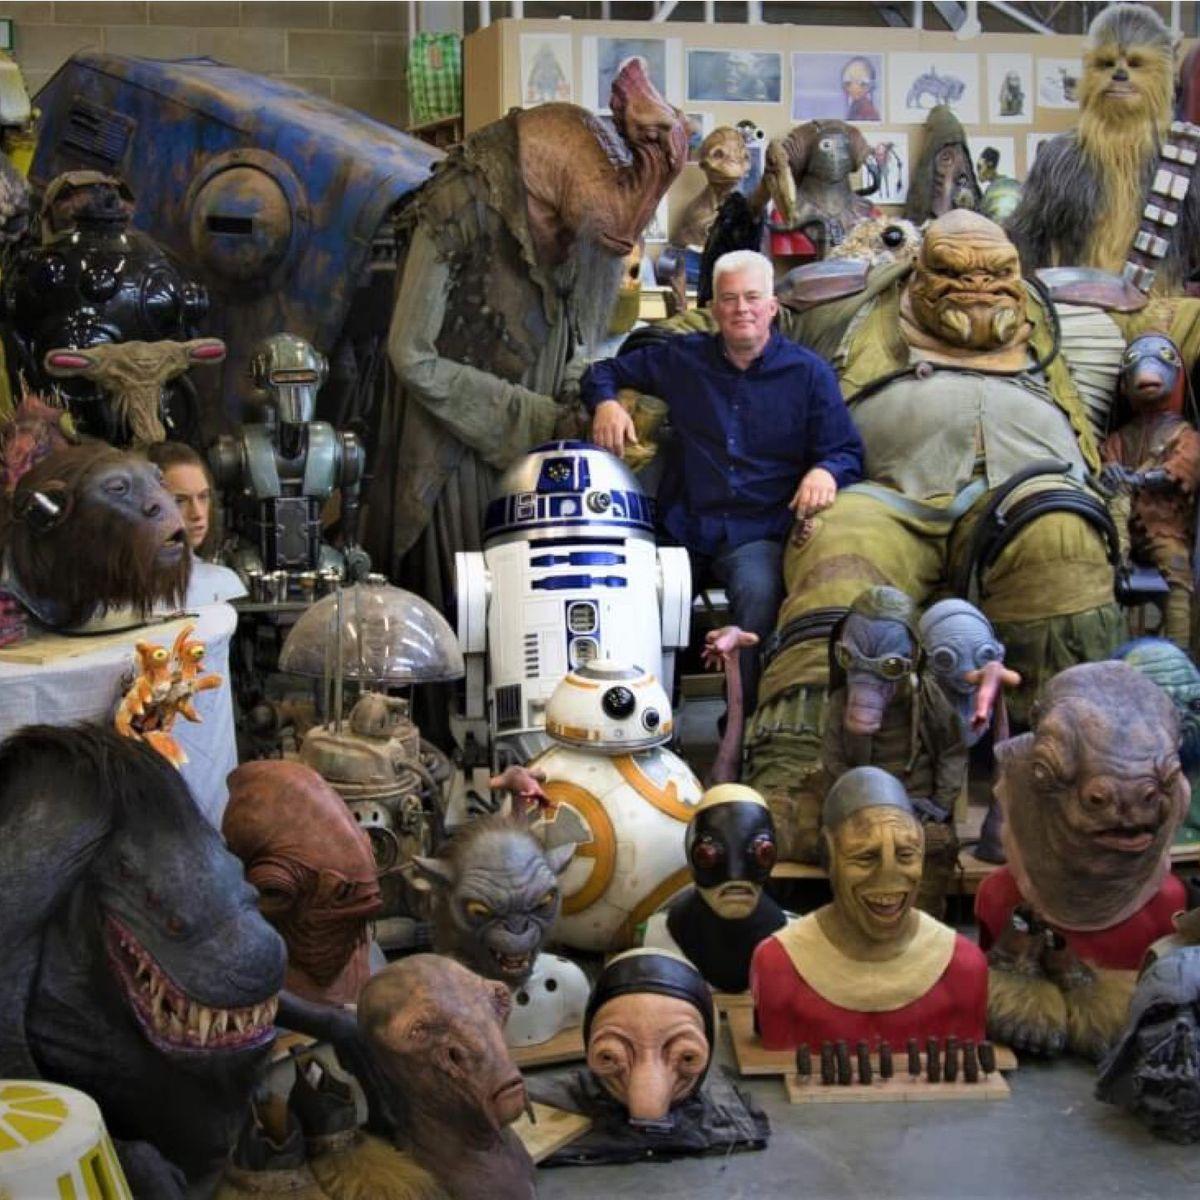 Star Wars creatures